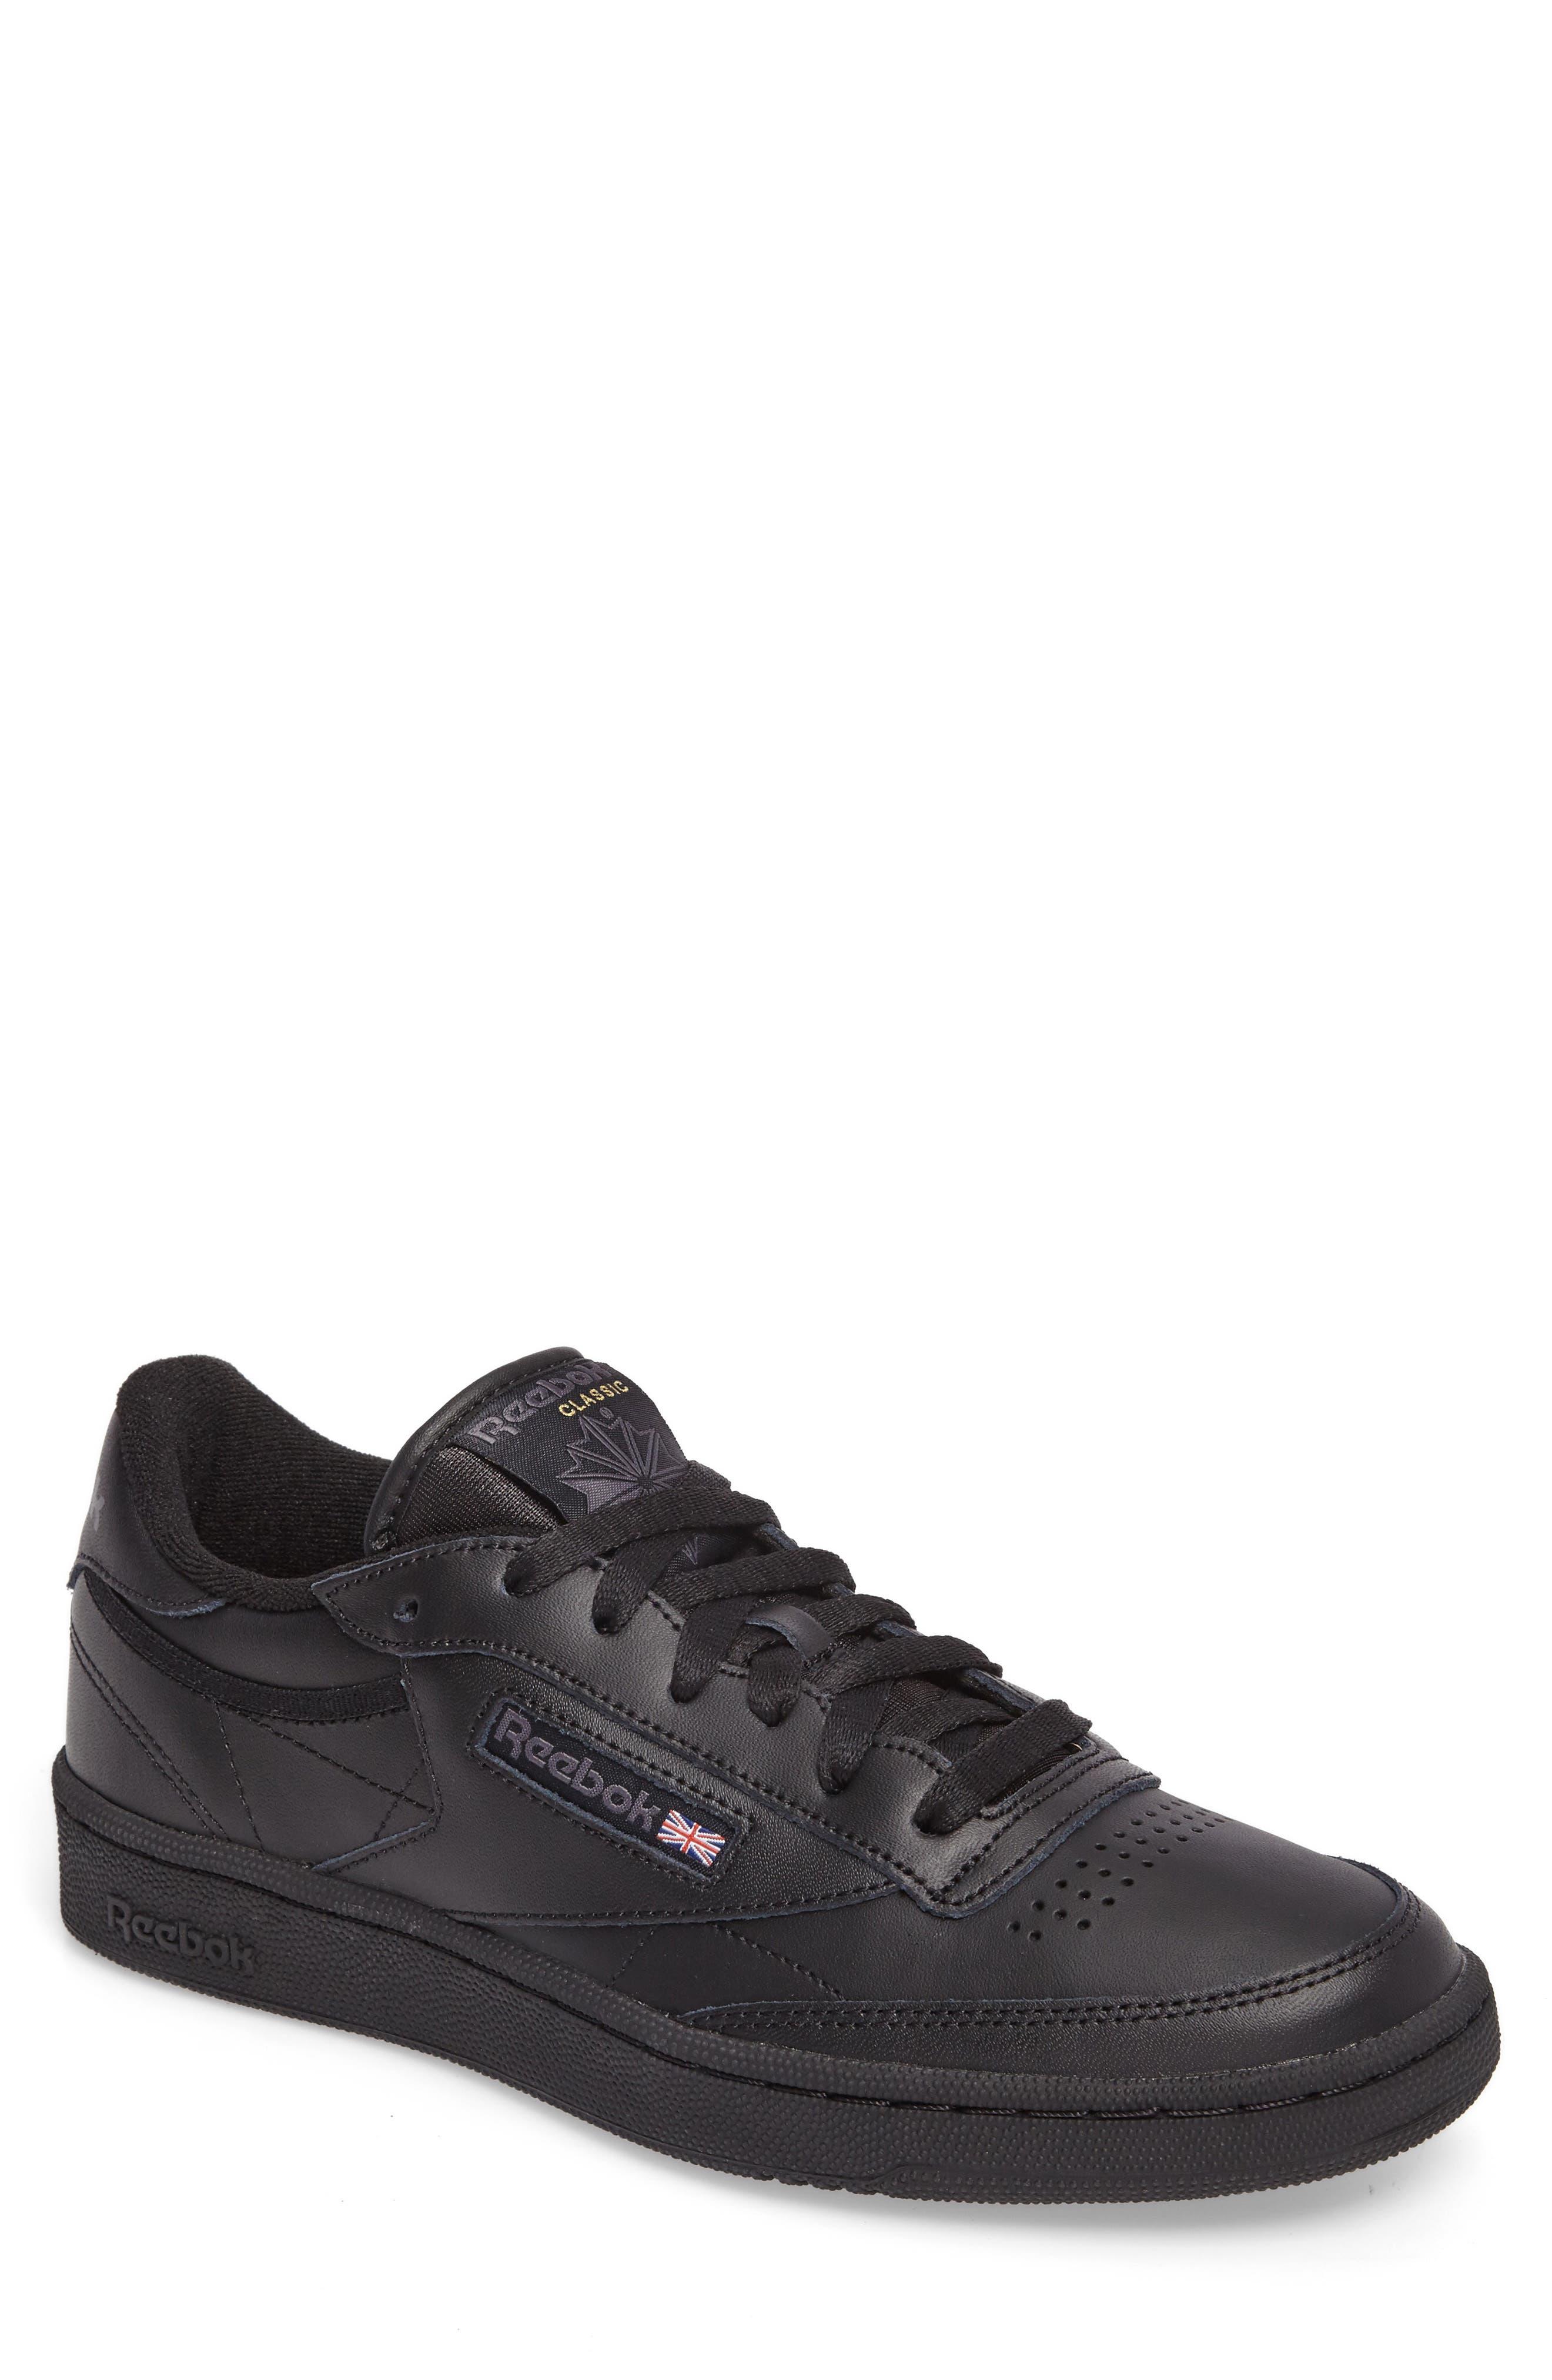 Alternate Image 1 Selected - Reebok Club C 85 Sneaker (Men)